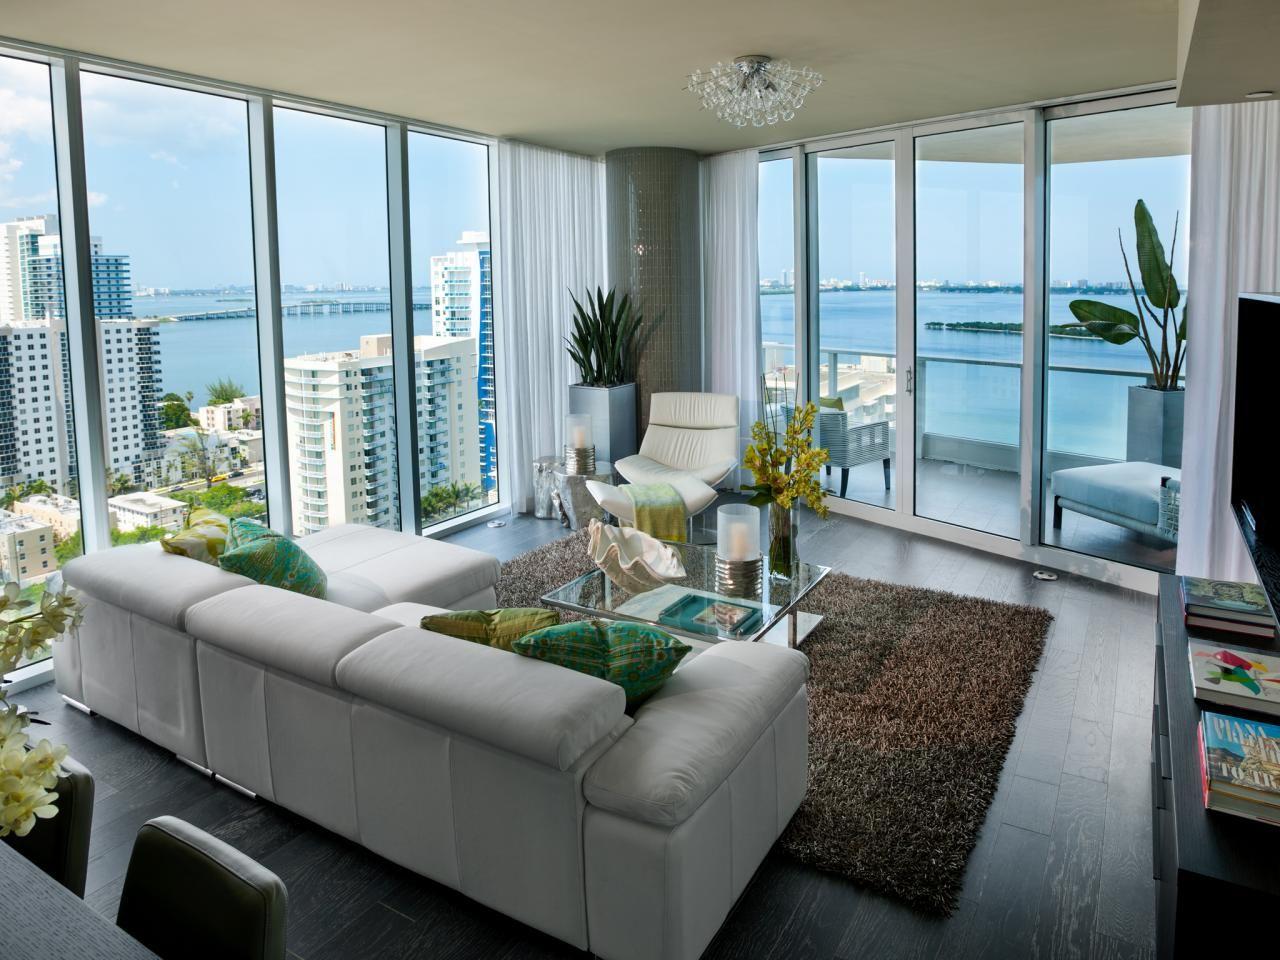 Design Tour The Best Of Hgtv Dream Homes Hgtv Green Homes And Unique Hgtv Living Room Design Ideas Decorating Design